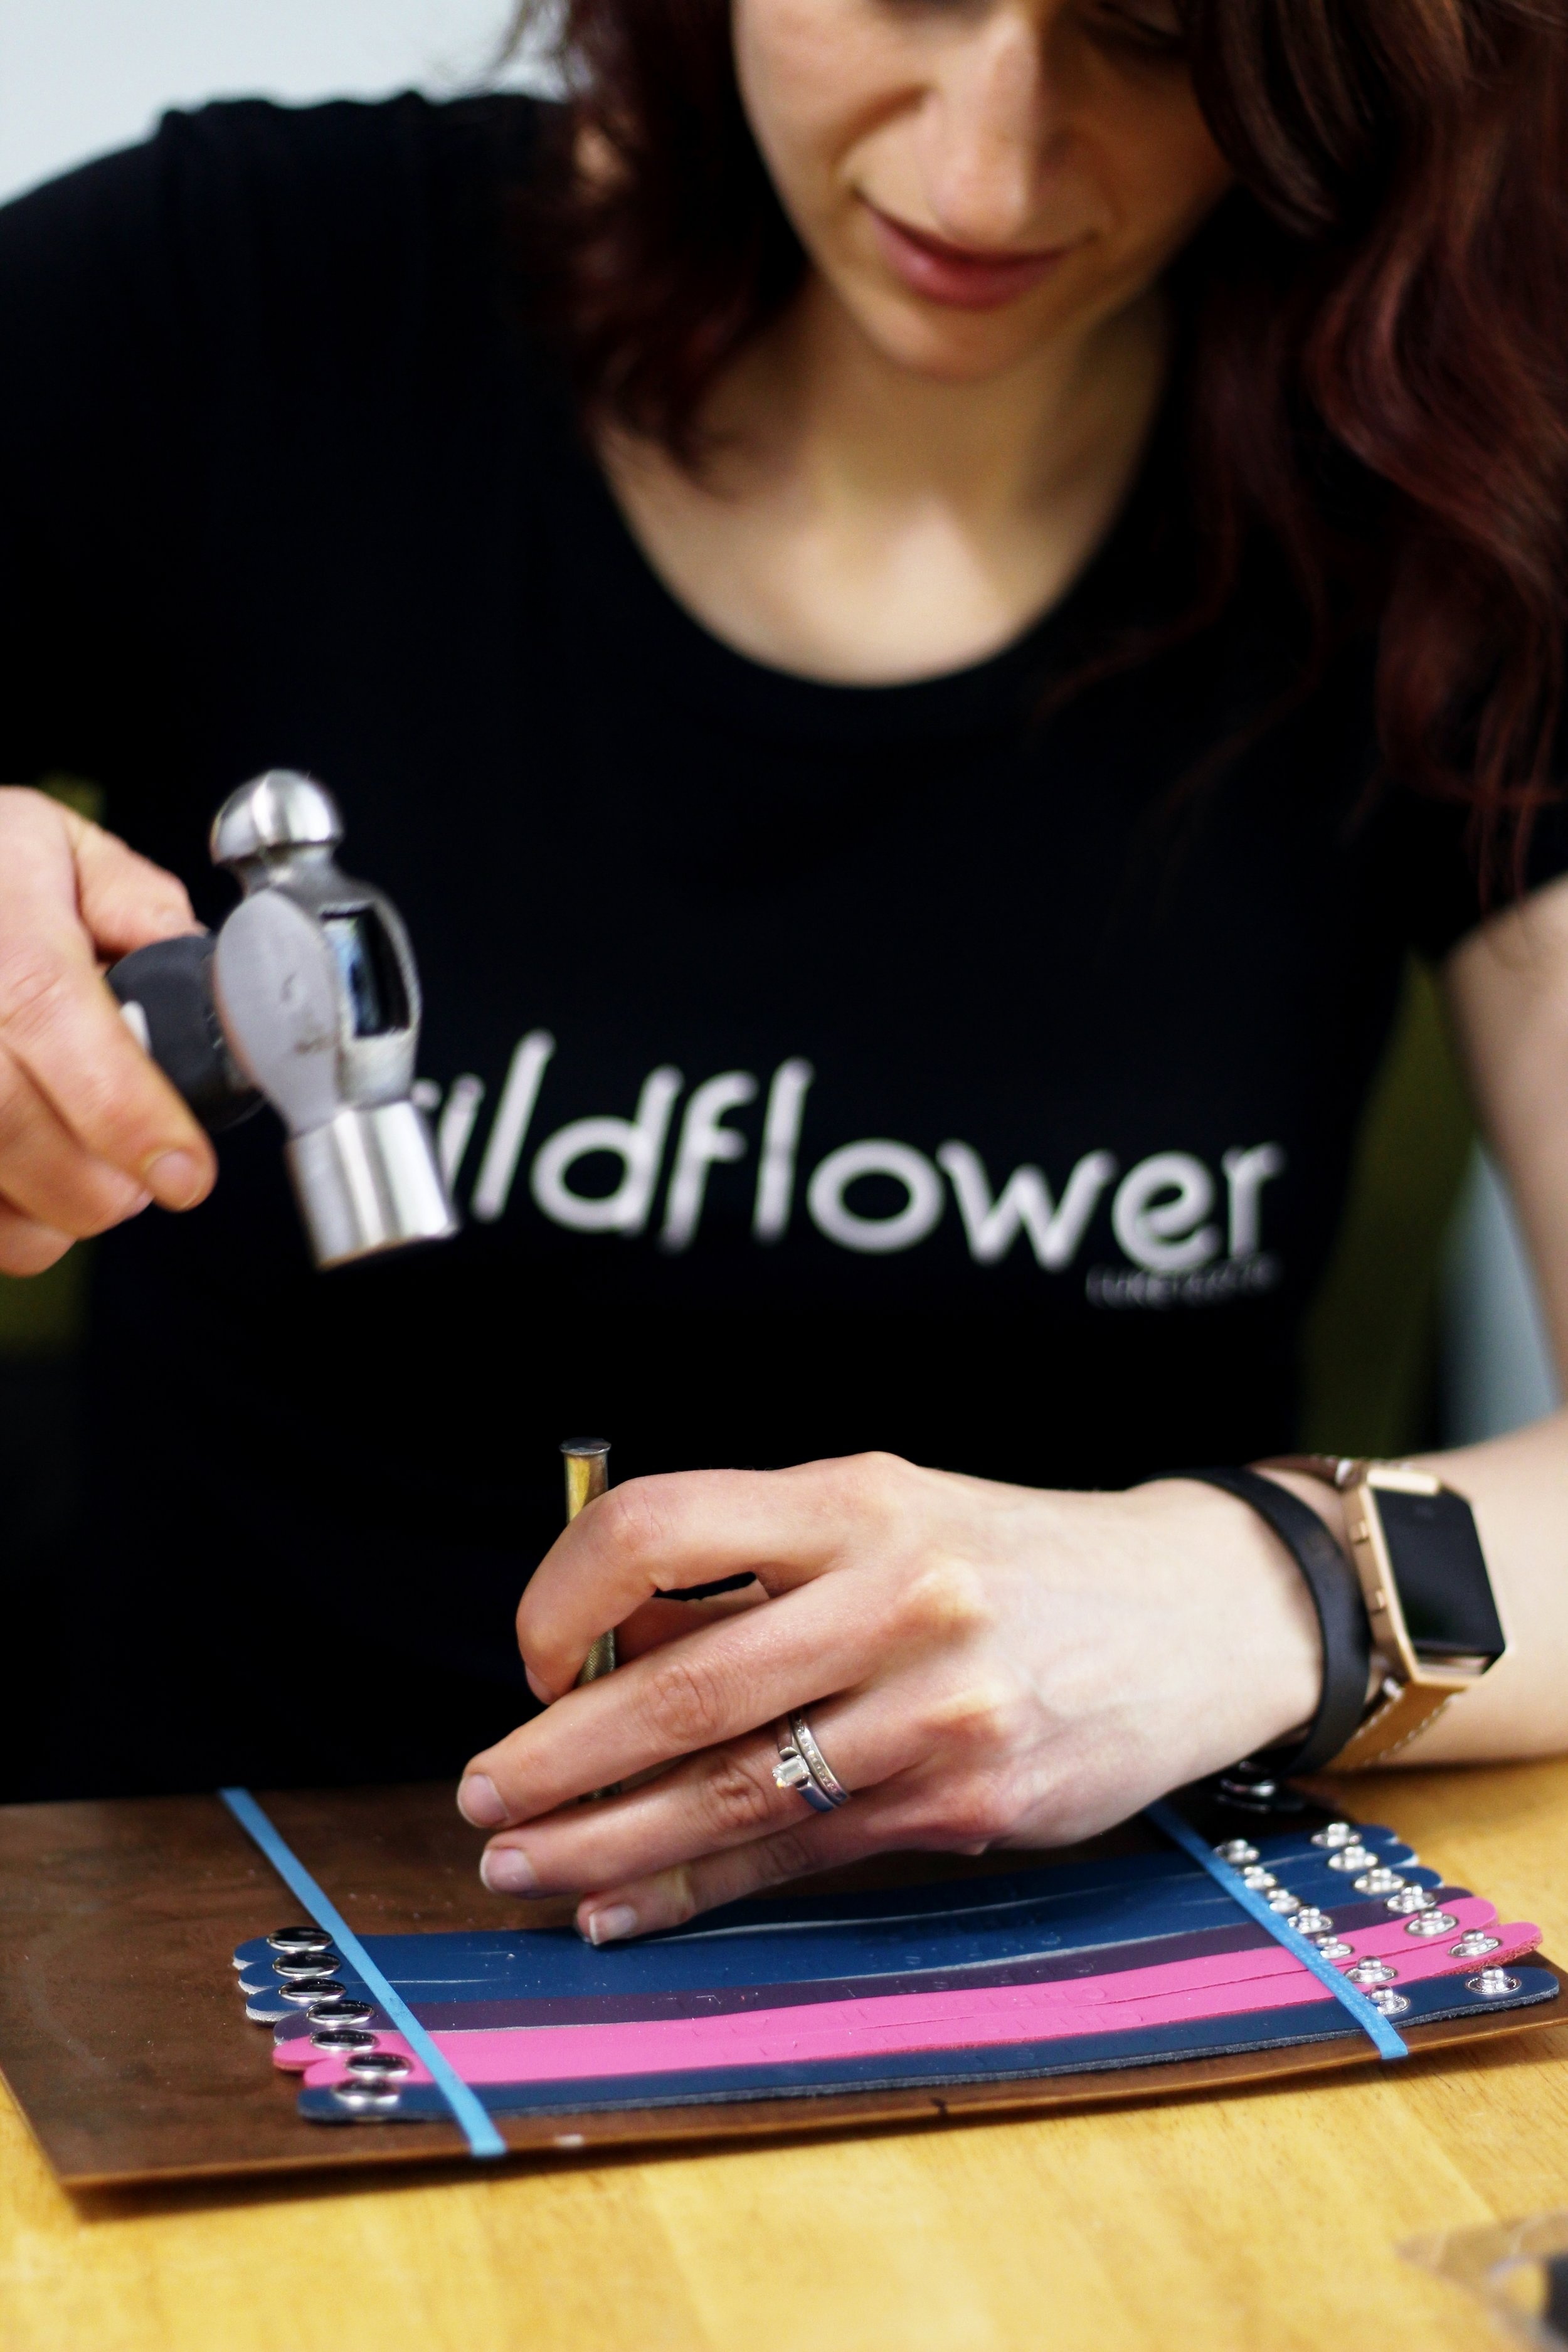 Wildflower Trust (31).JPG